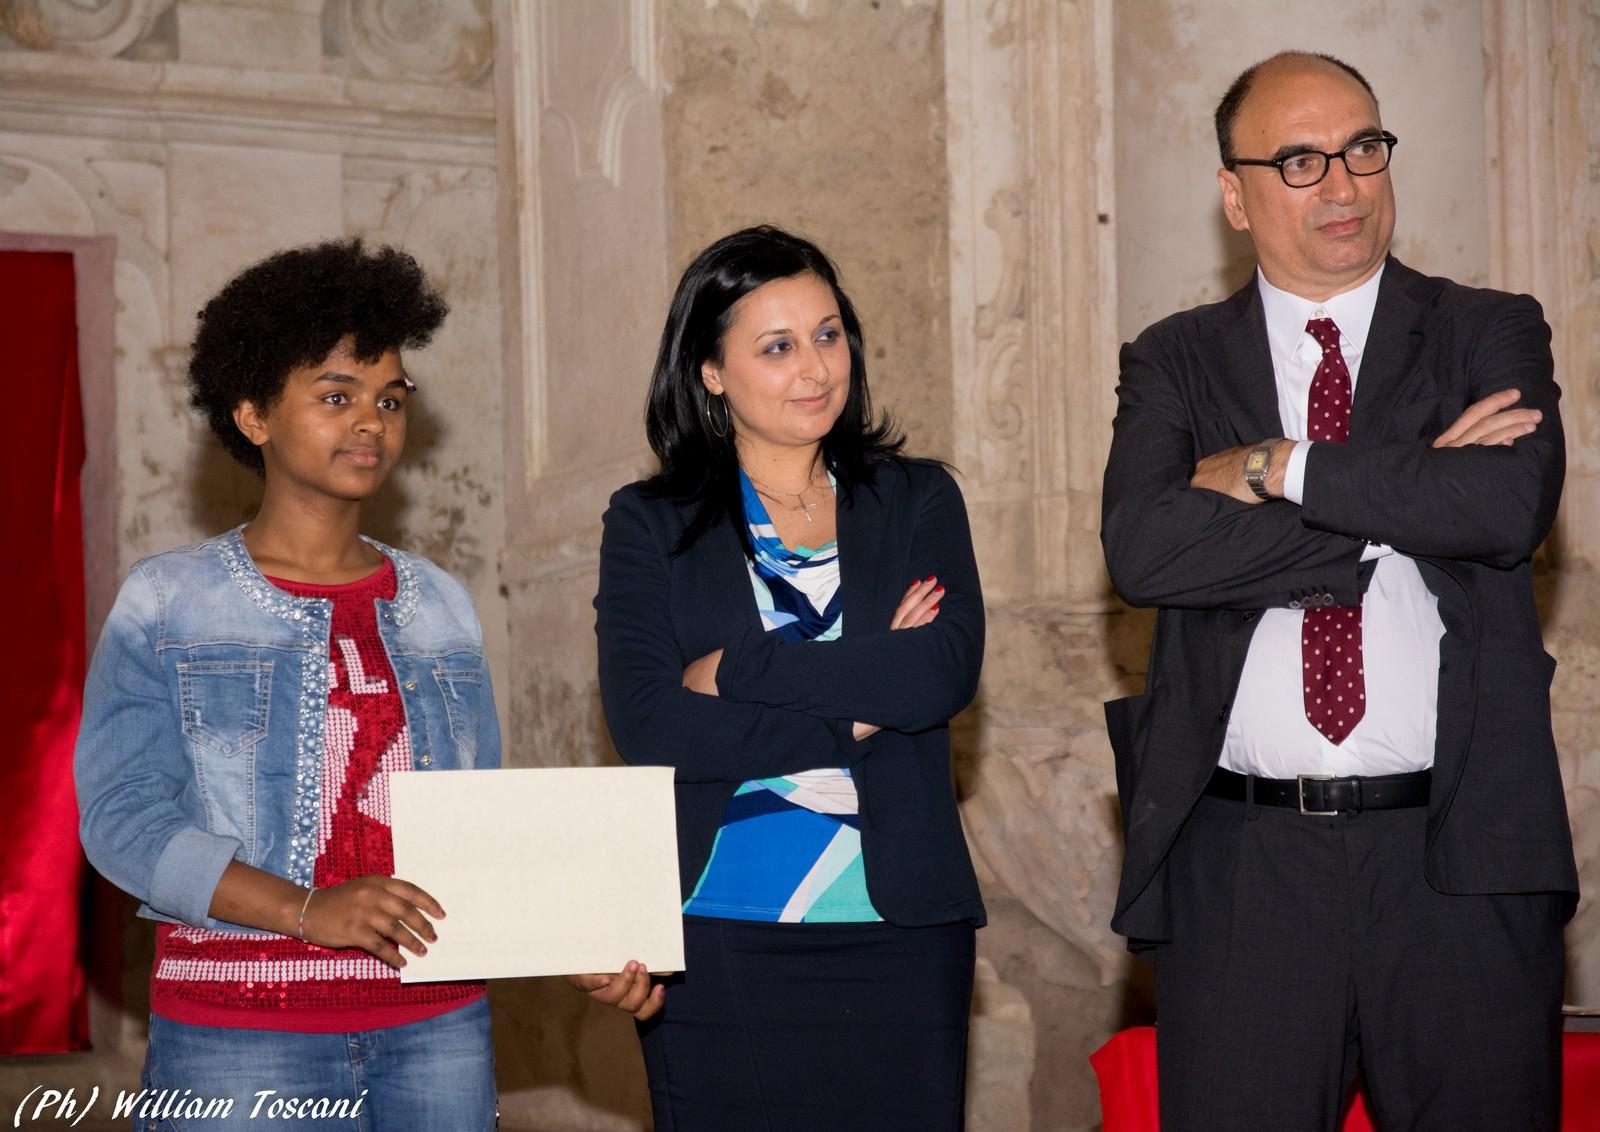 Premio_pagano_040